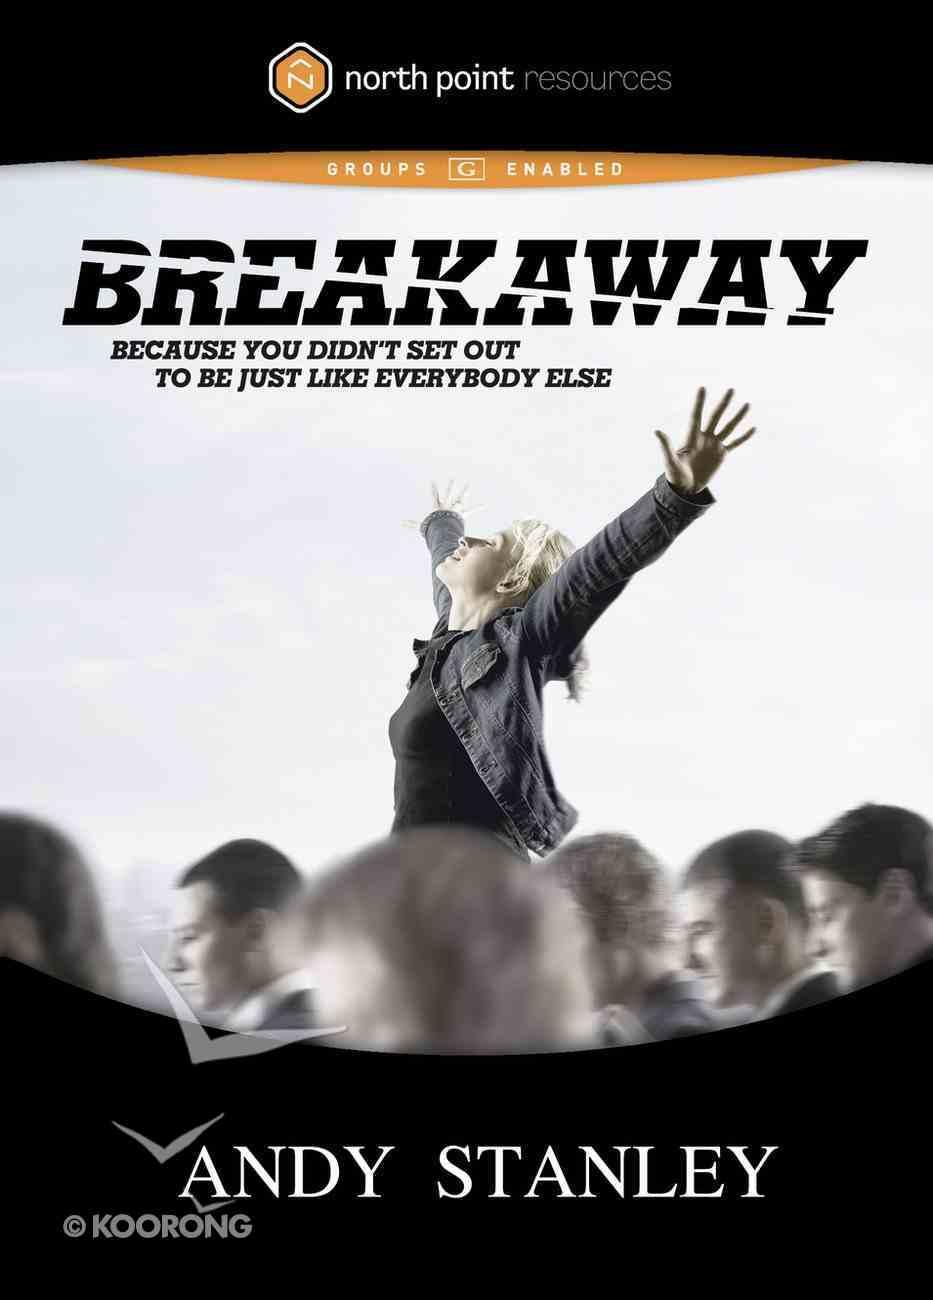 Breakaway DVD (North Point Resources Series) DVD